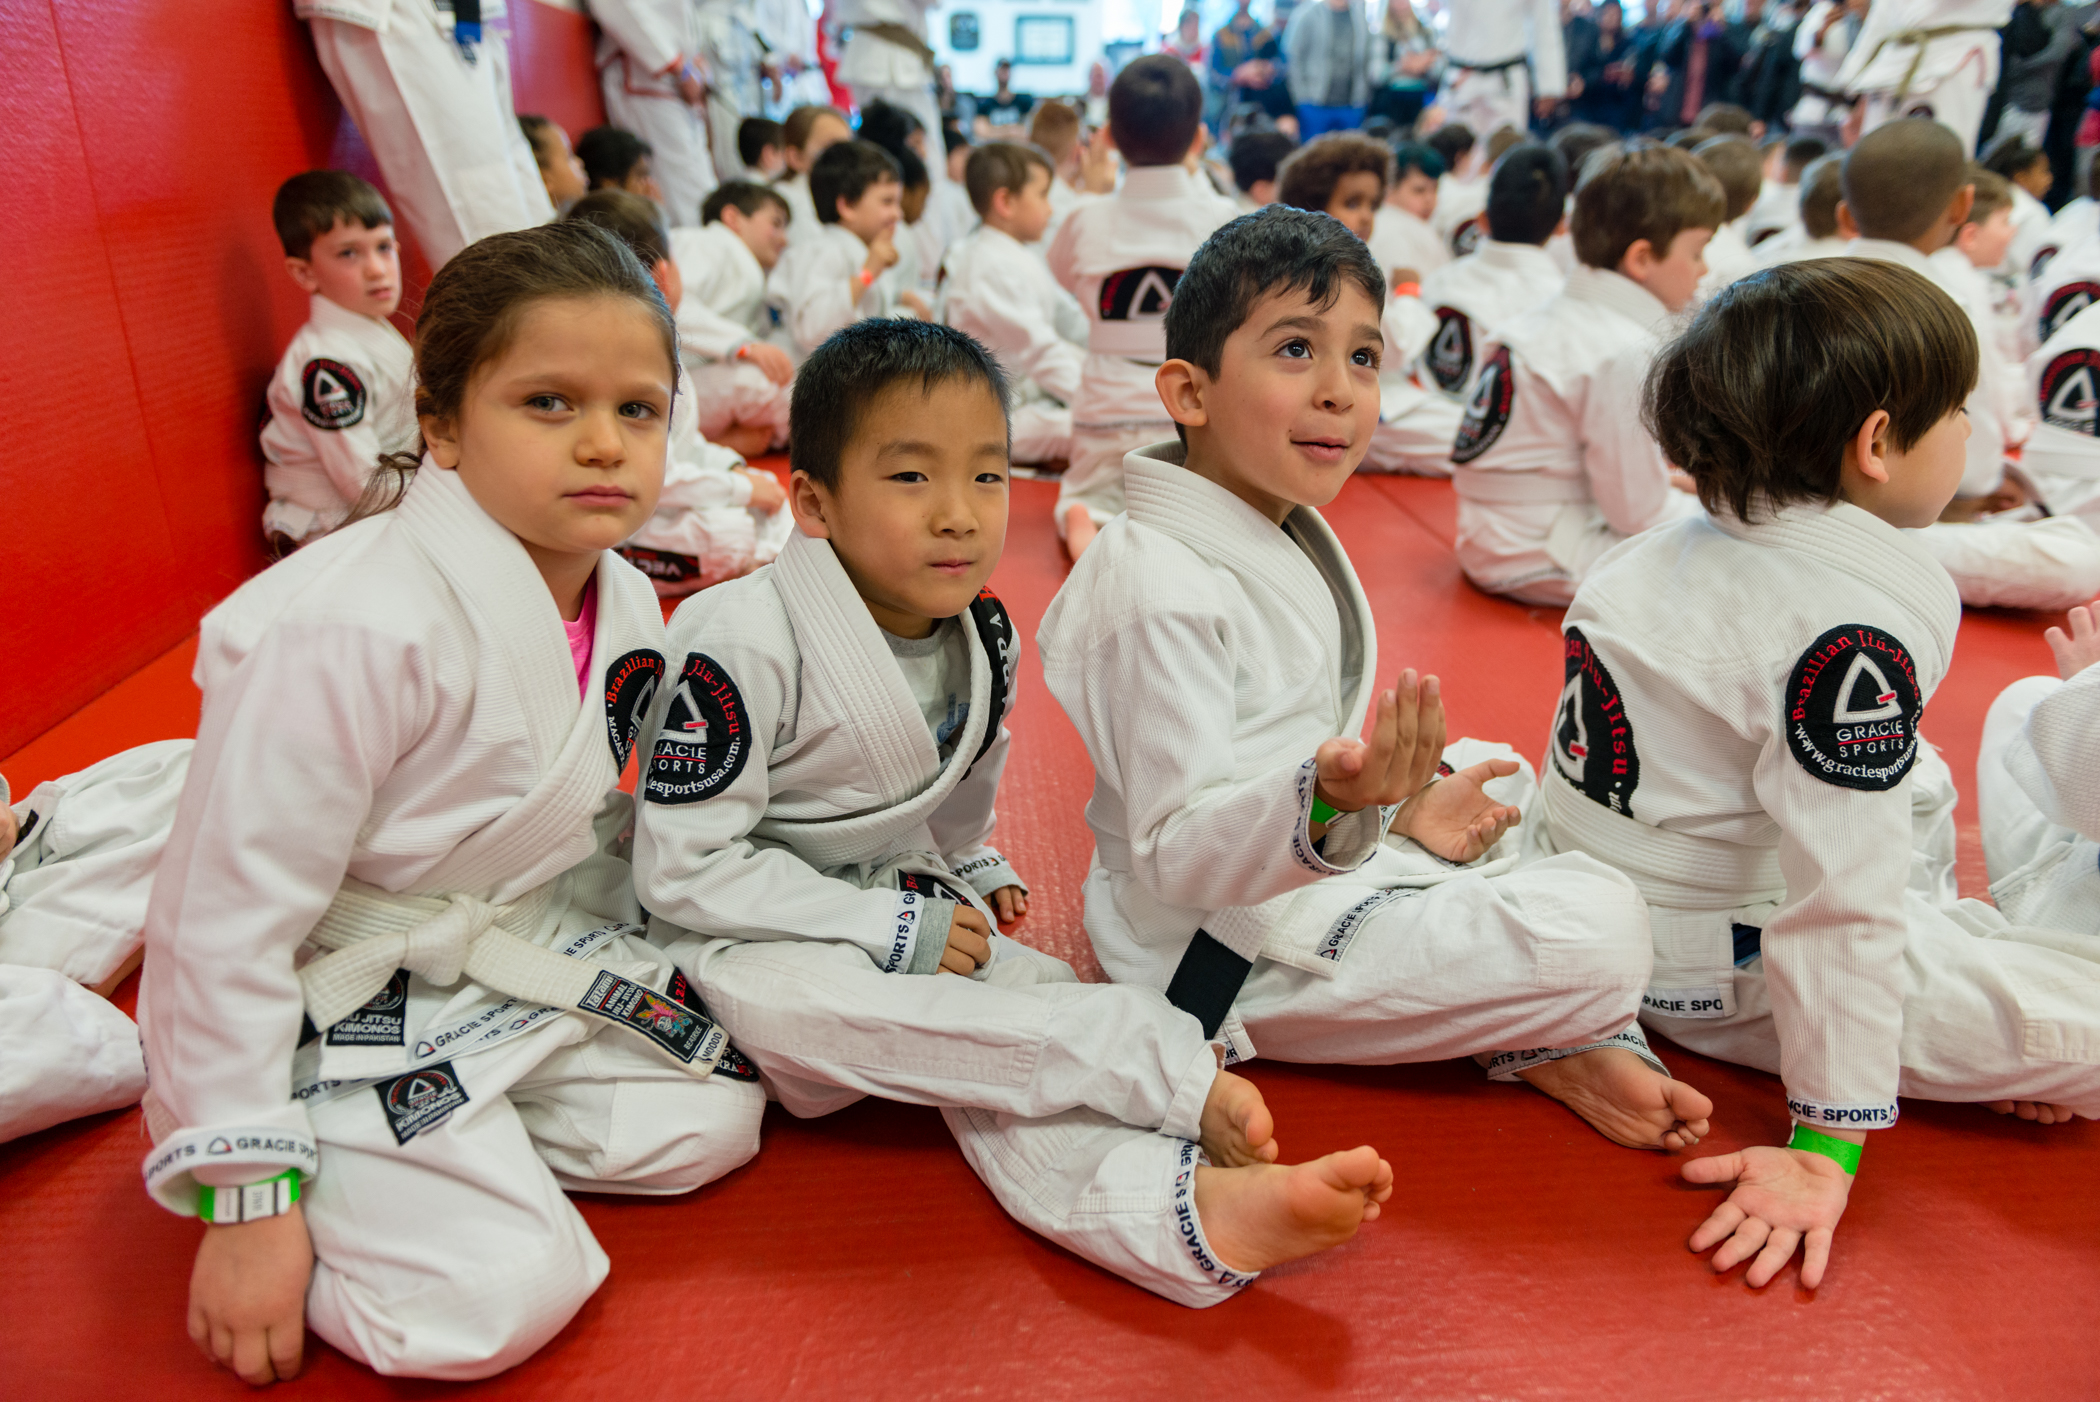 Gracie-Sports-Kids-16.jpg